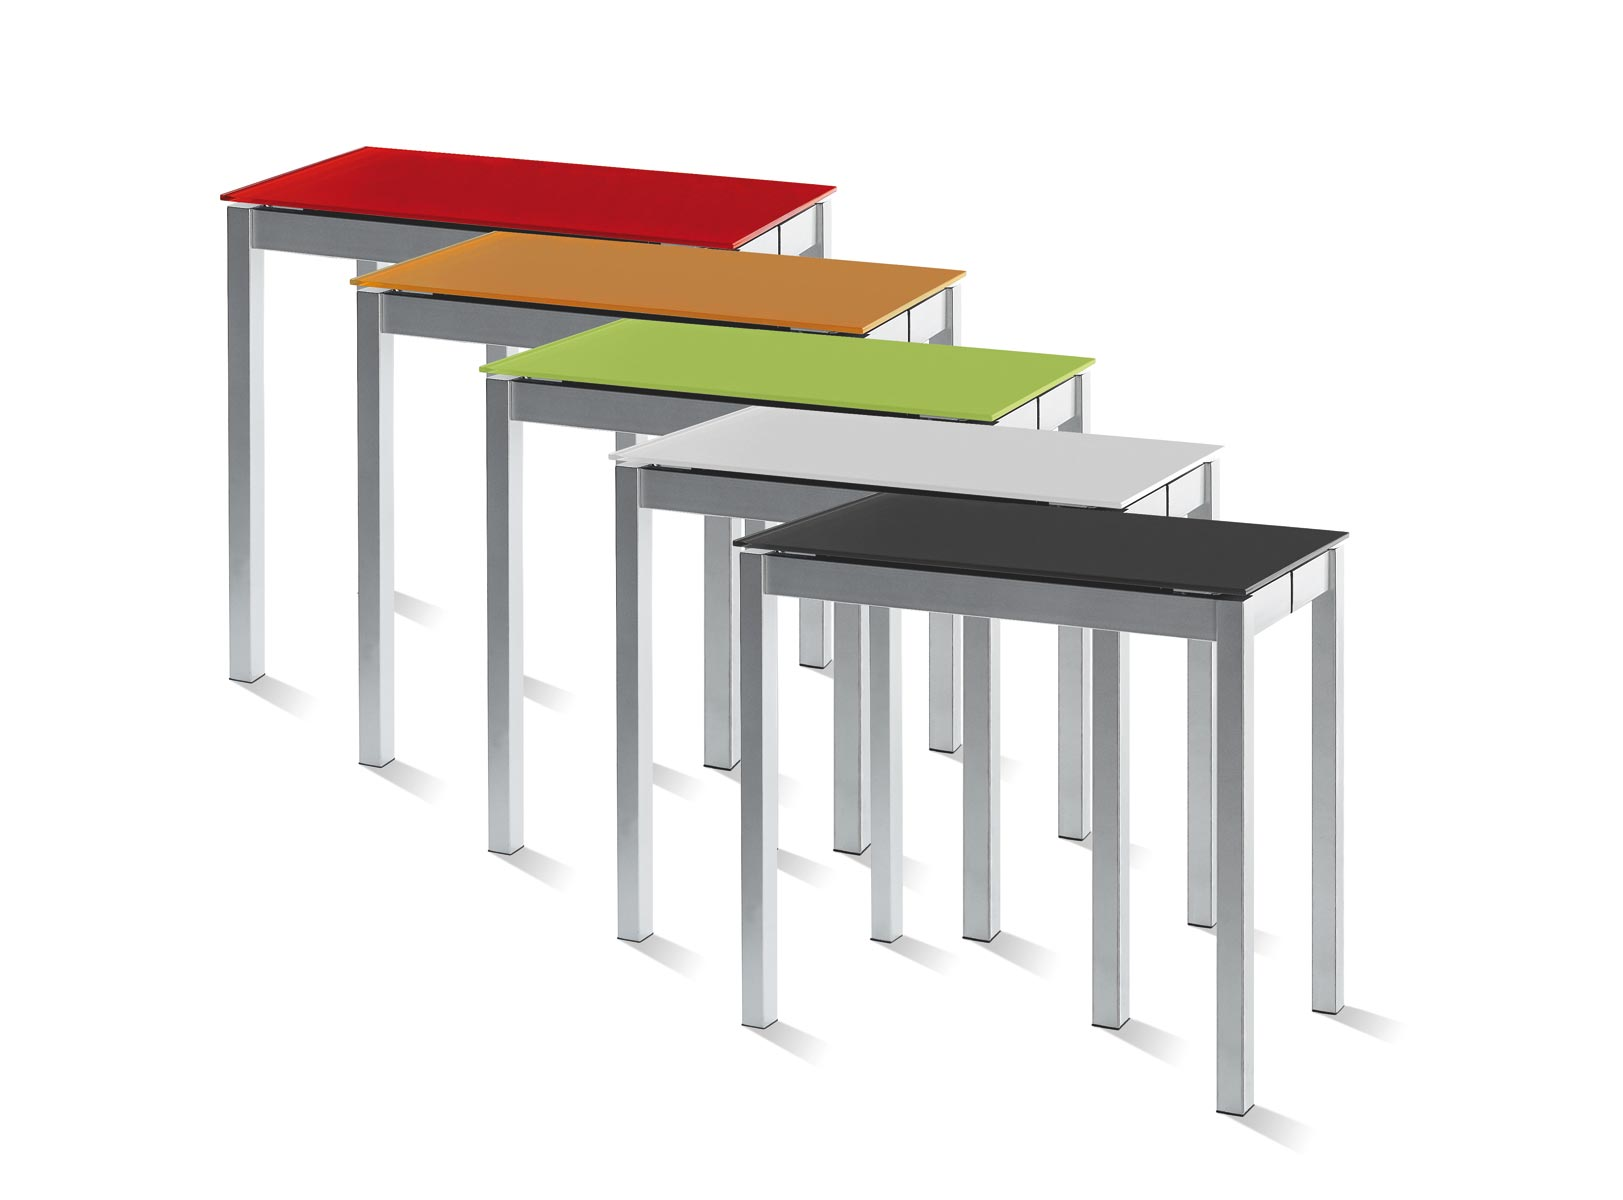 Mesa de cocina peque a y extensible for Precios de mesas de cocina